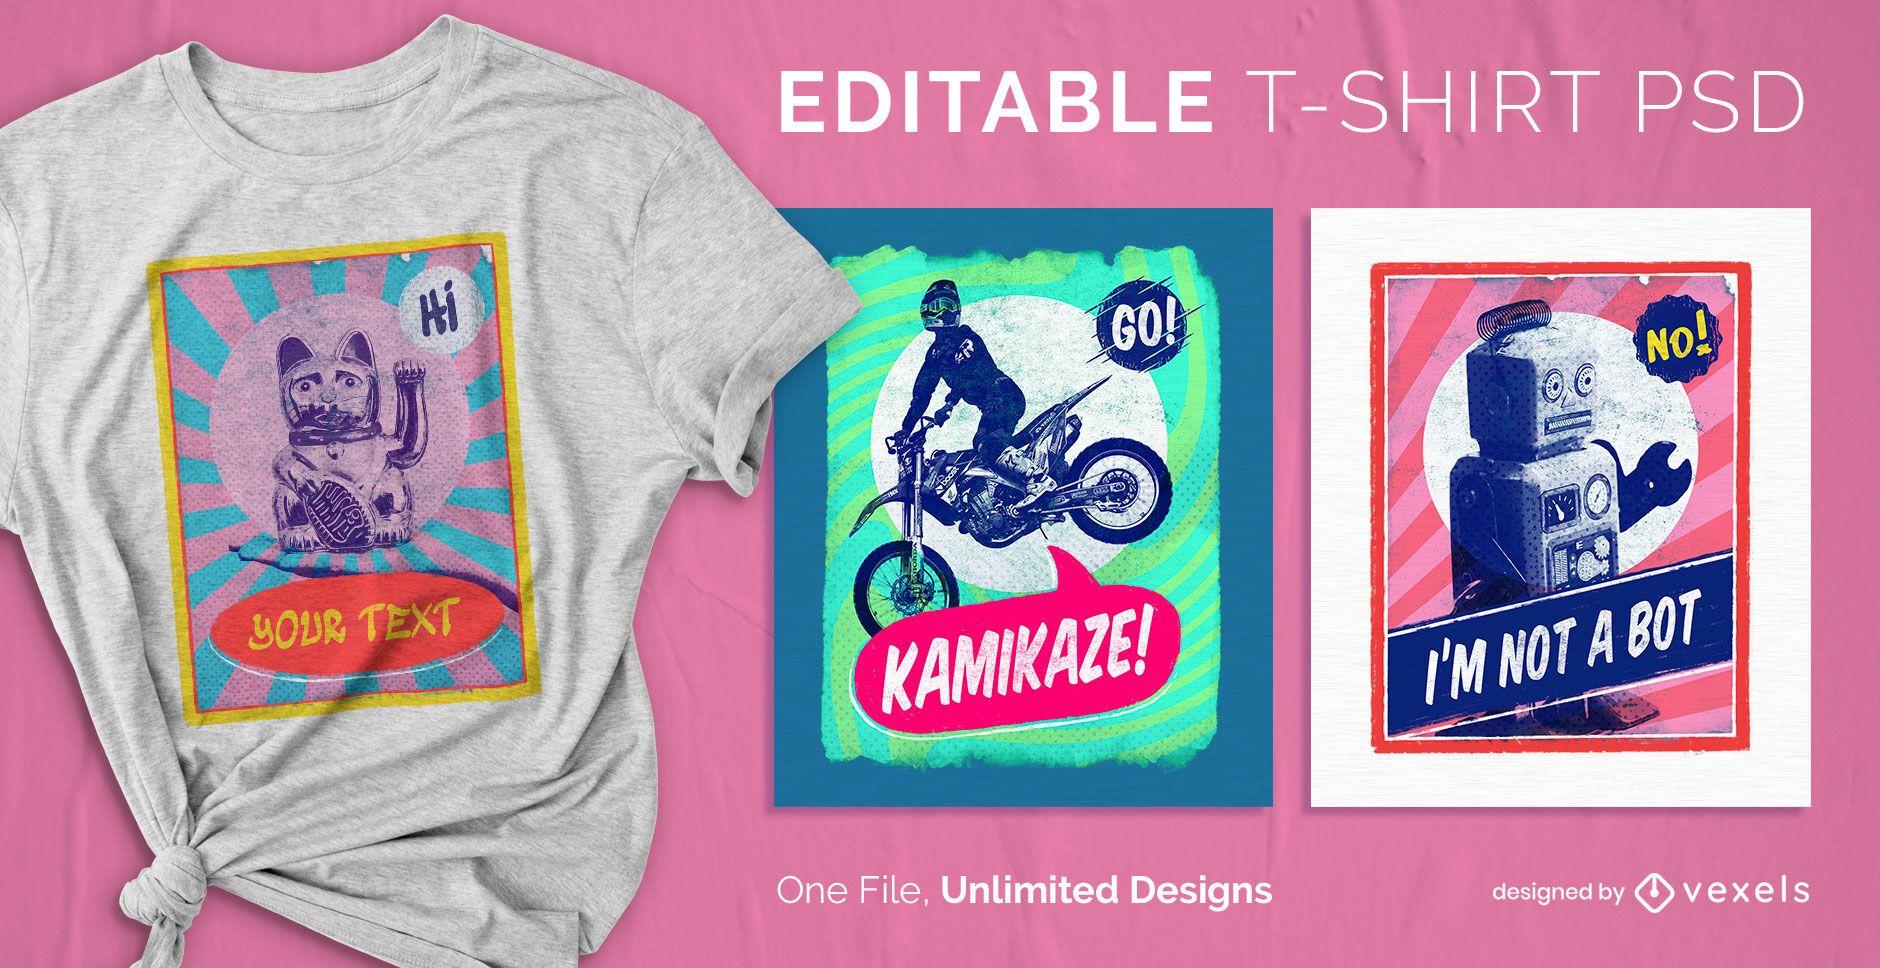 Poster scalable t-shirt psd